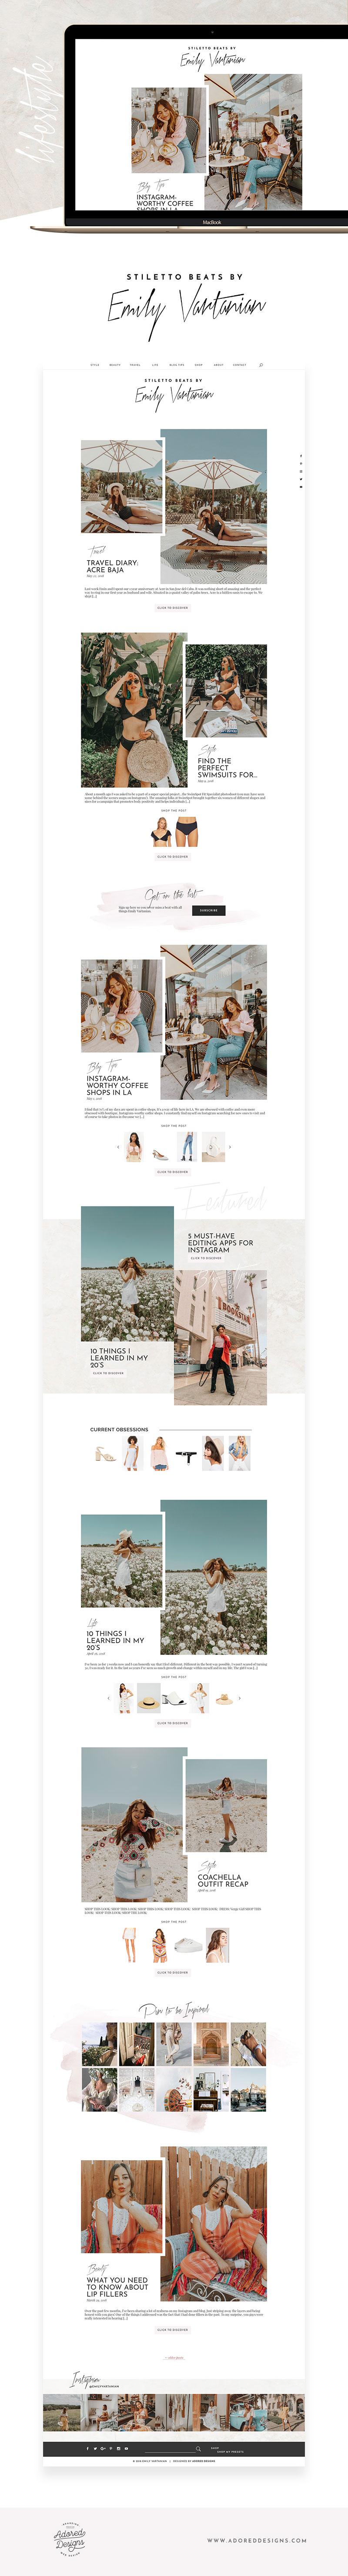 Aleksandra Rogala-Jacek | Emily Vartanian | Adored Designs | Creative Lady Directory